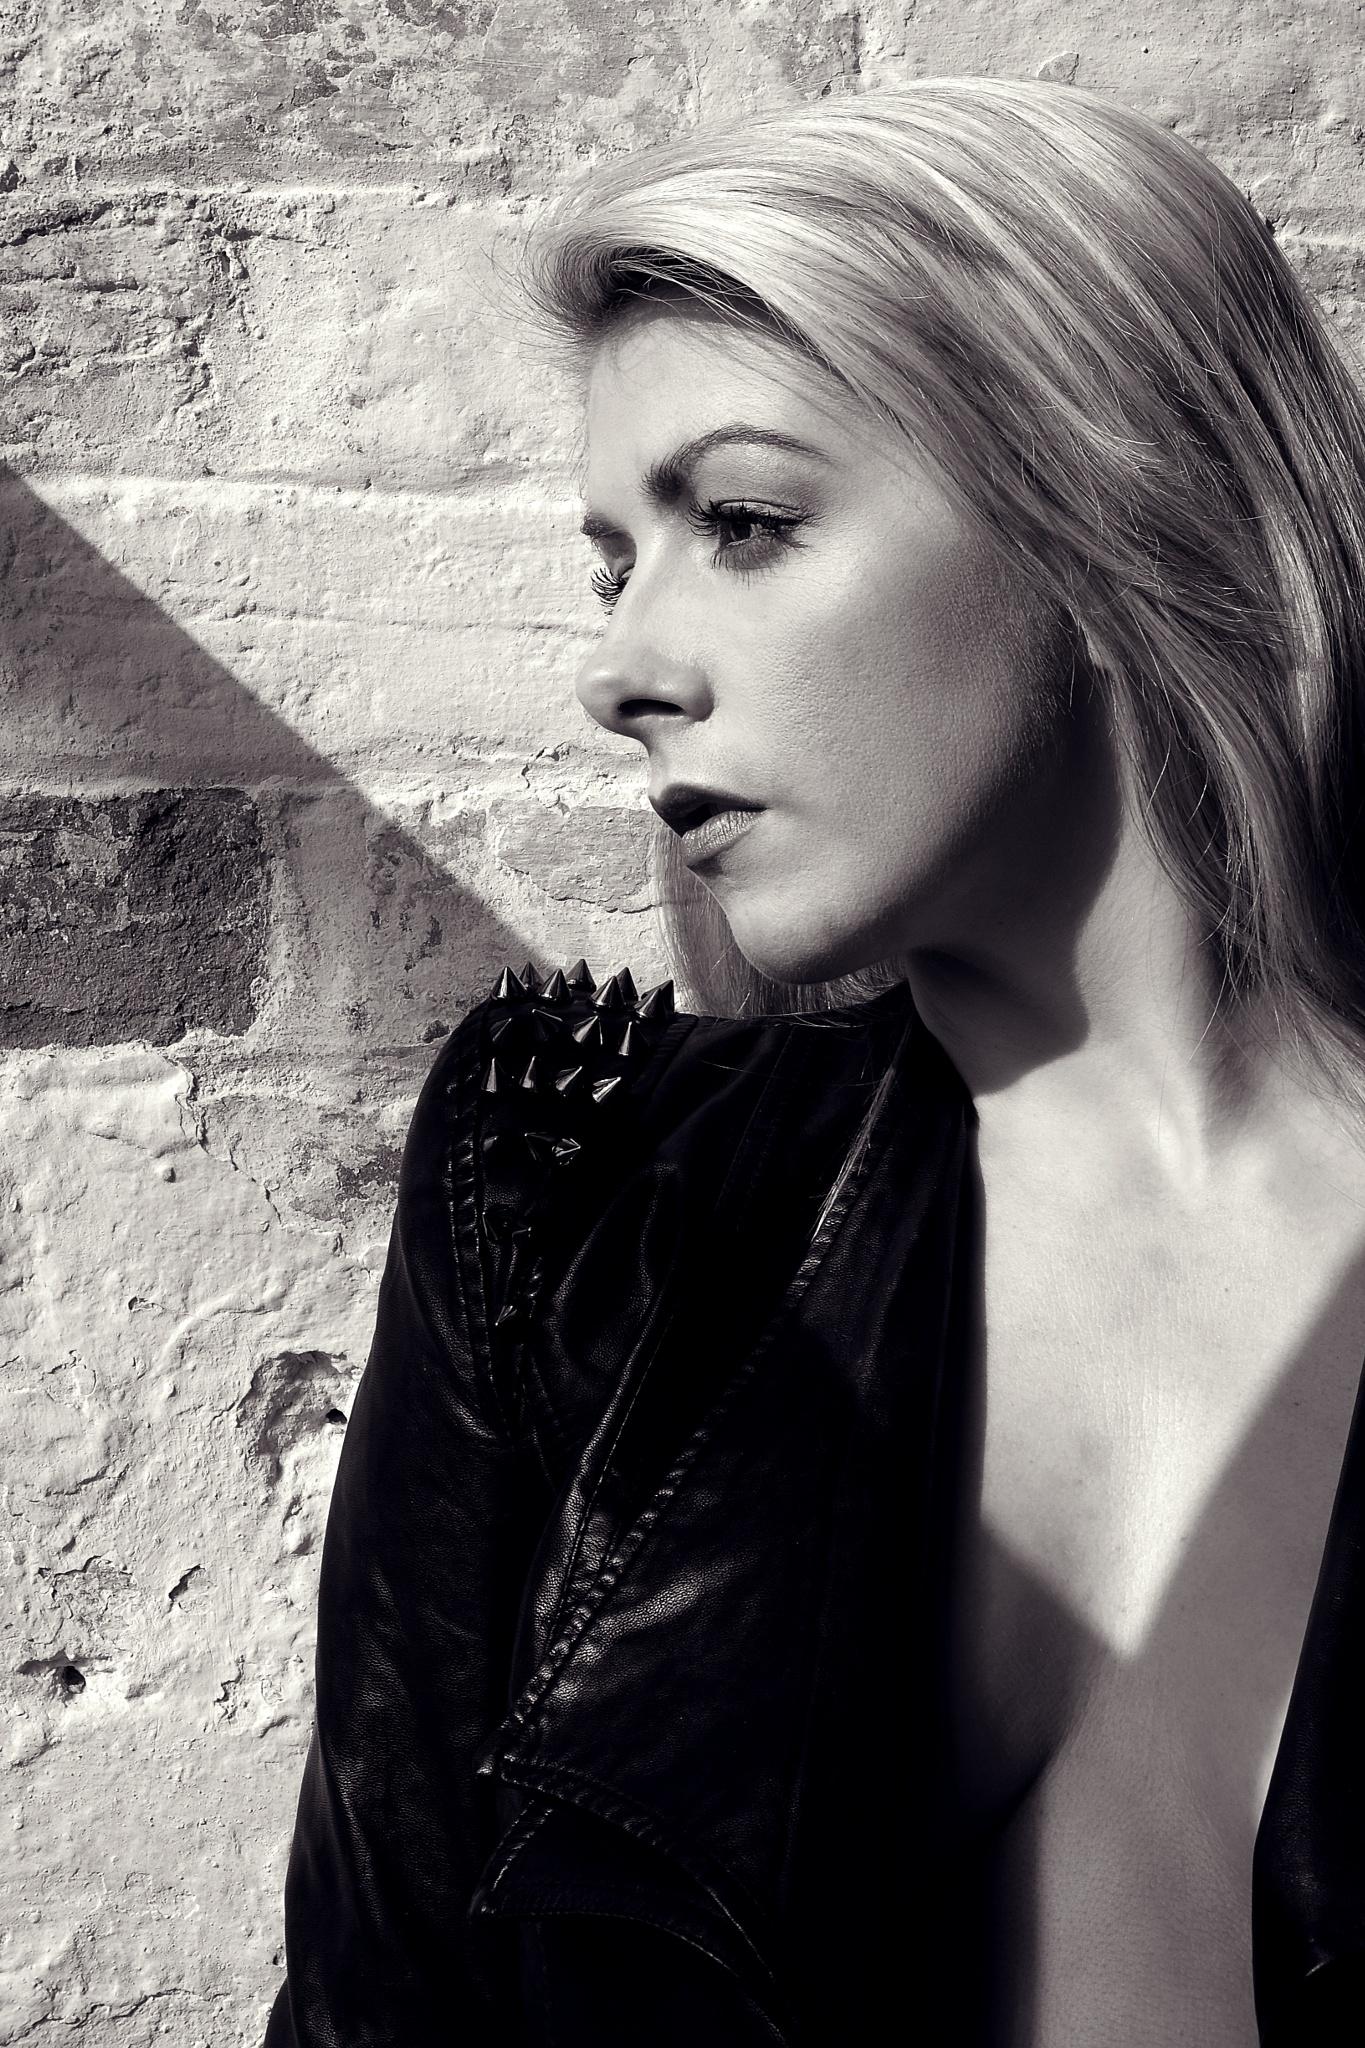 Leather Jacket by NickJamesPhotography